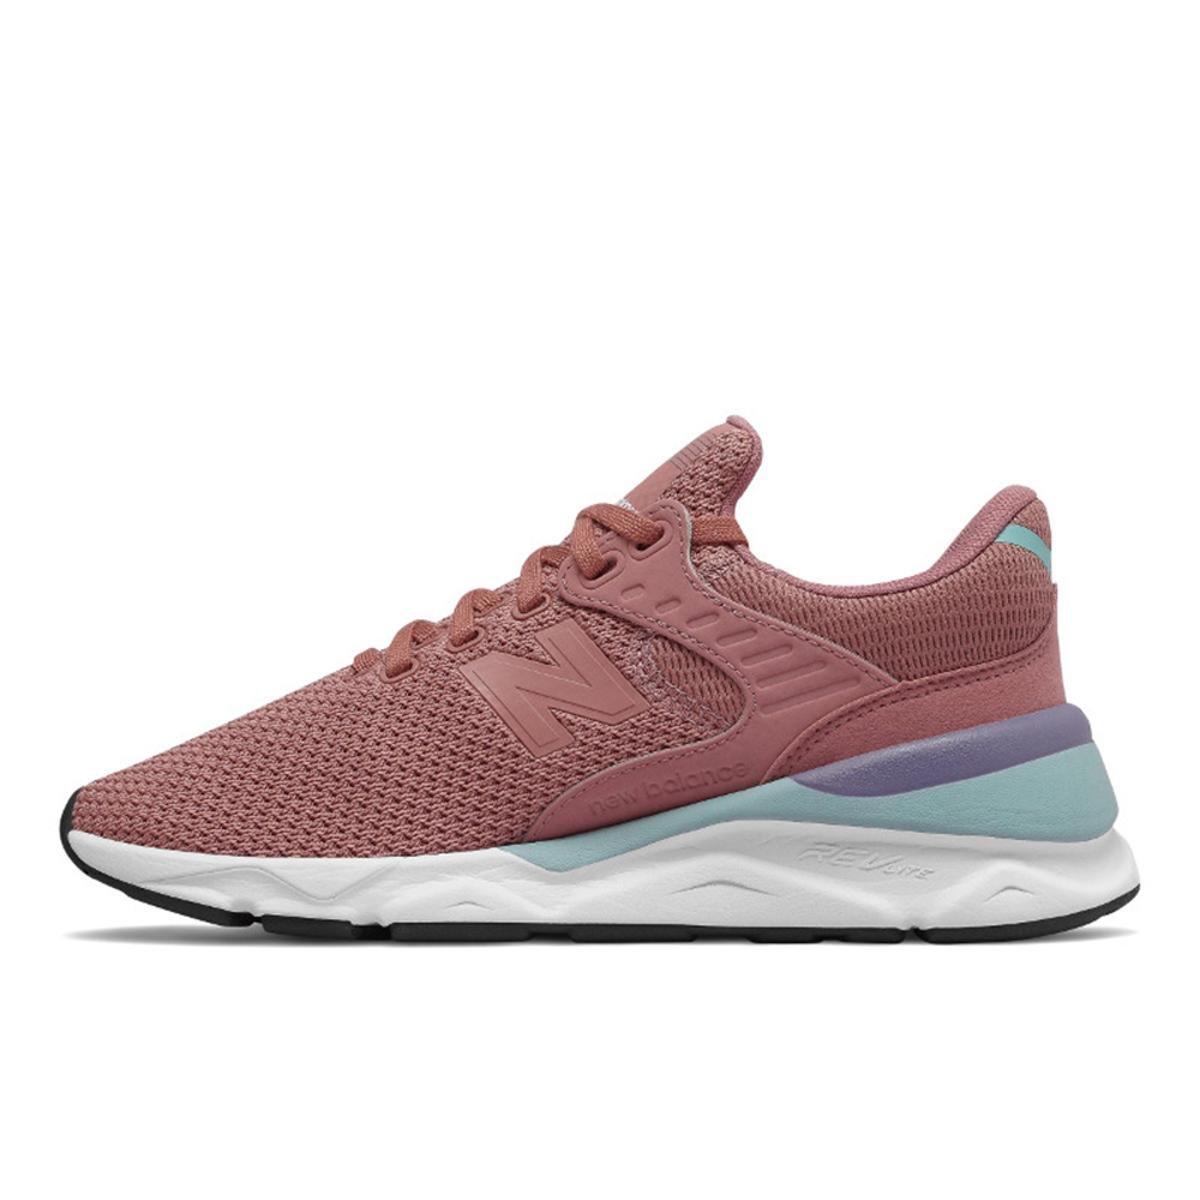 e568182c1d ... Tênis New Balance X90 Casual Feminino - Rosa - Compre Agora Netshoes  37cd71ab298bad  Tênis Nike Air Max ...